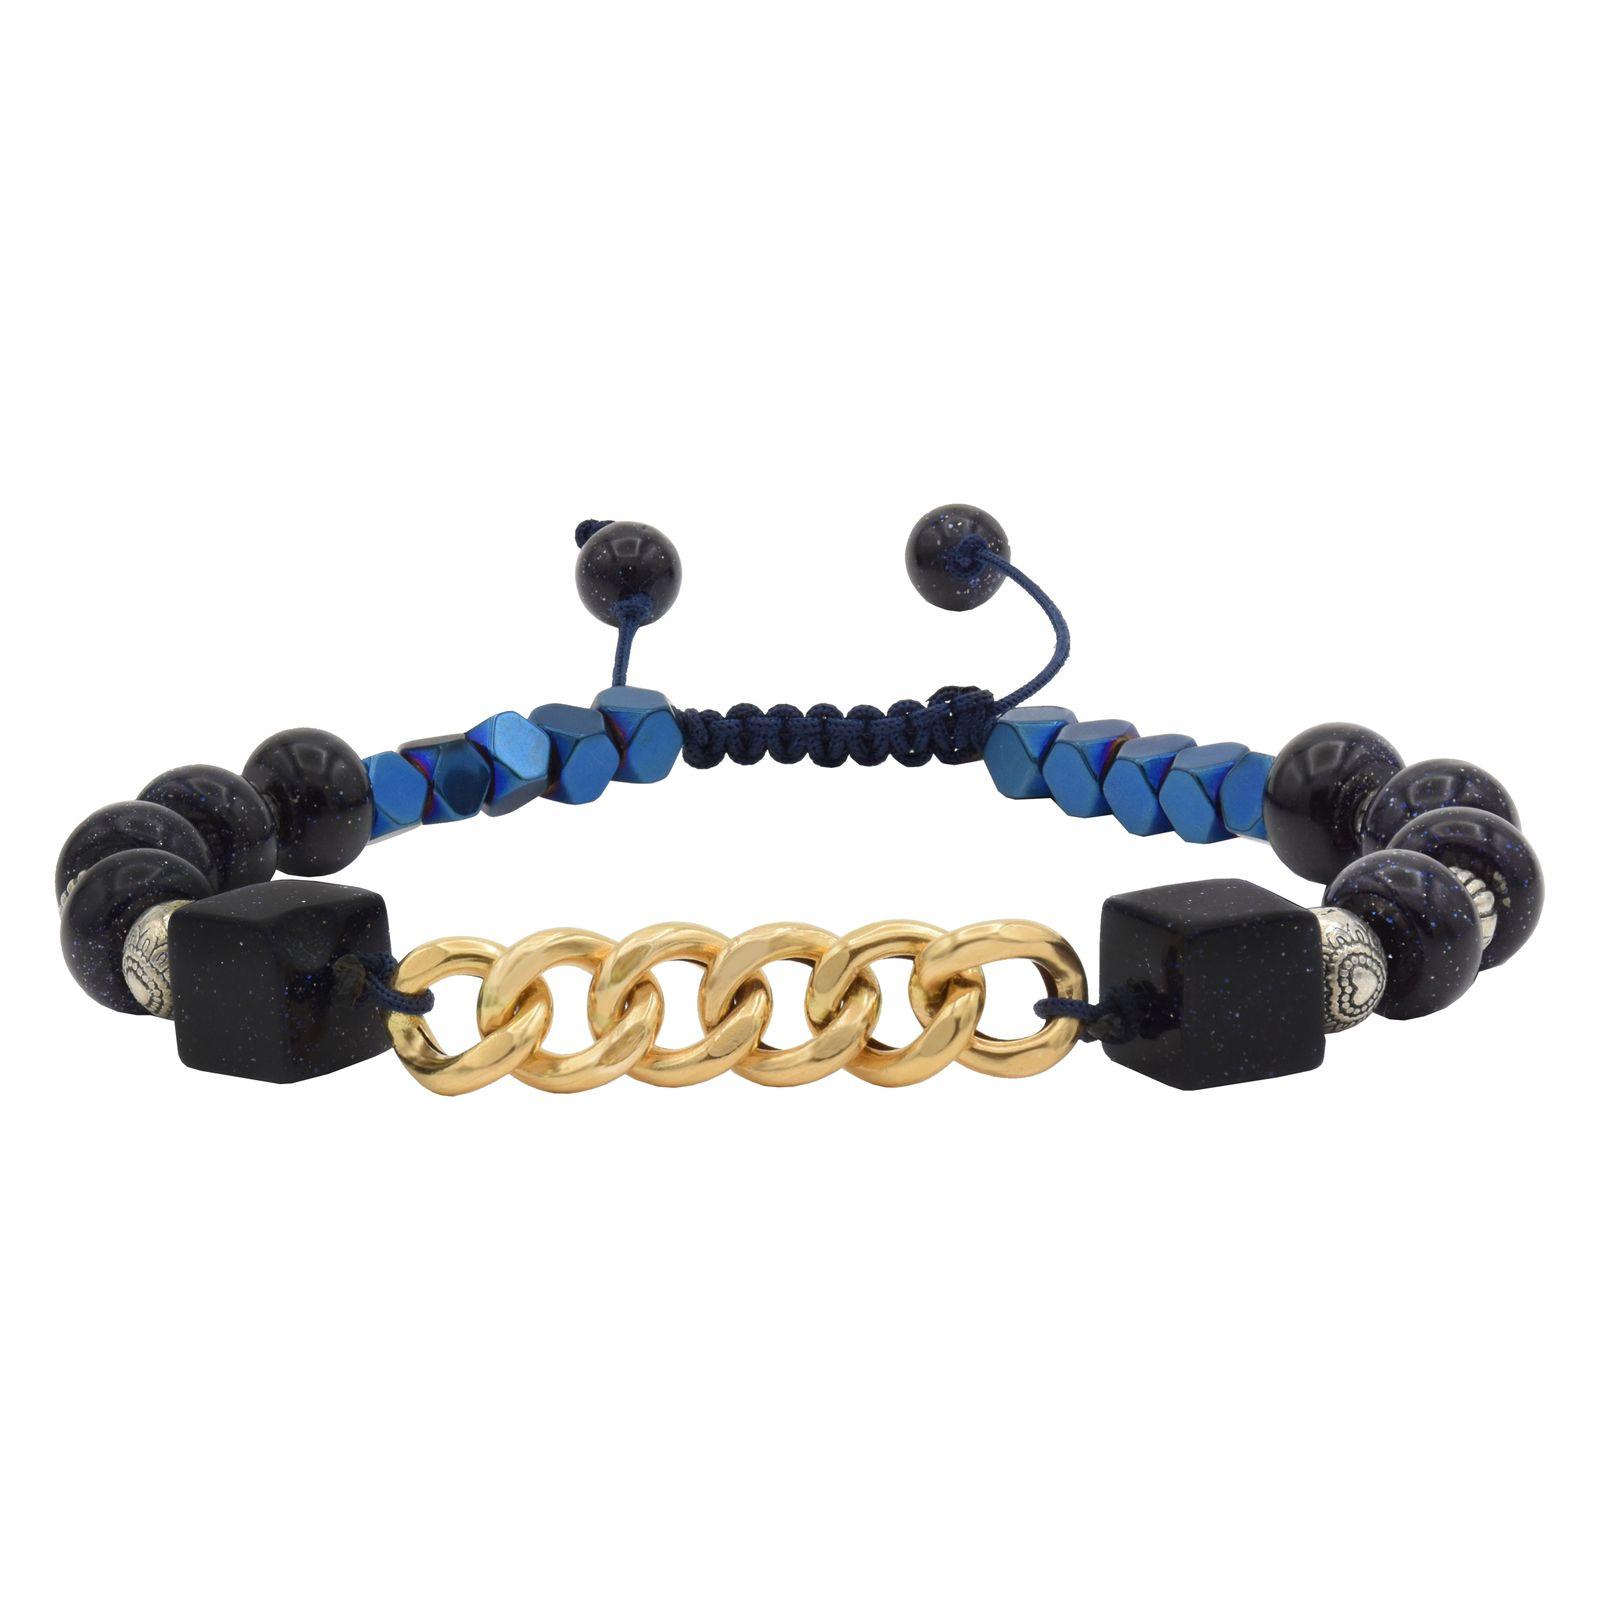 دستبند طلا 18 عیار زنانه آمانژ کد 1006D8951 -  - 2